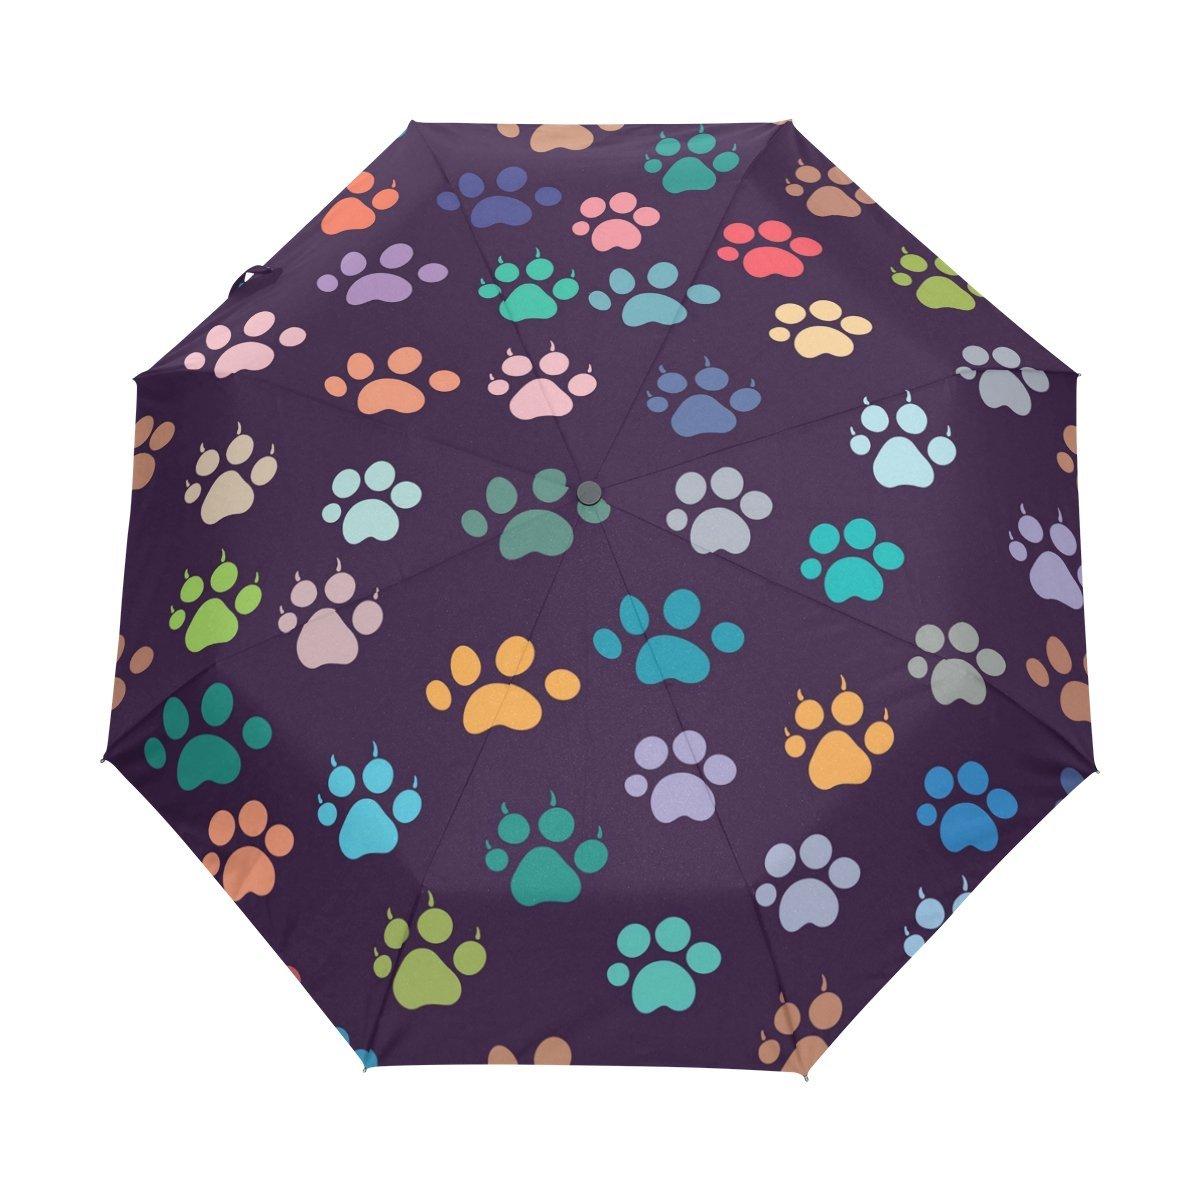 WOZO Animal Footprint Dog Paw 3 Folds Auto Open Close Umbrella